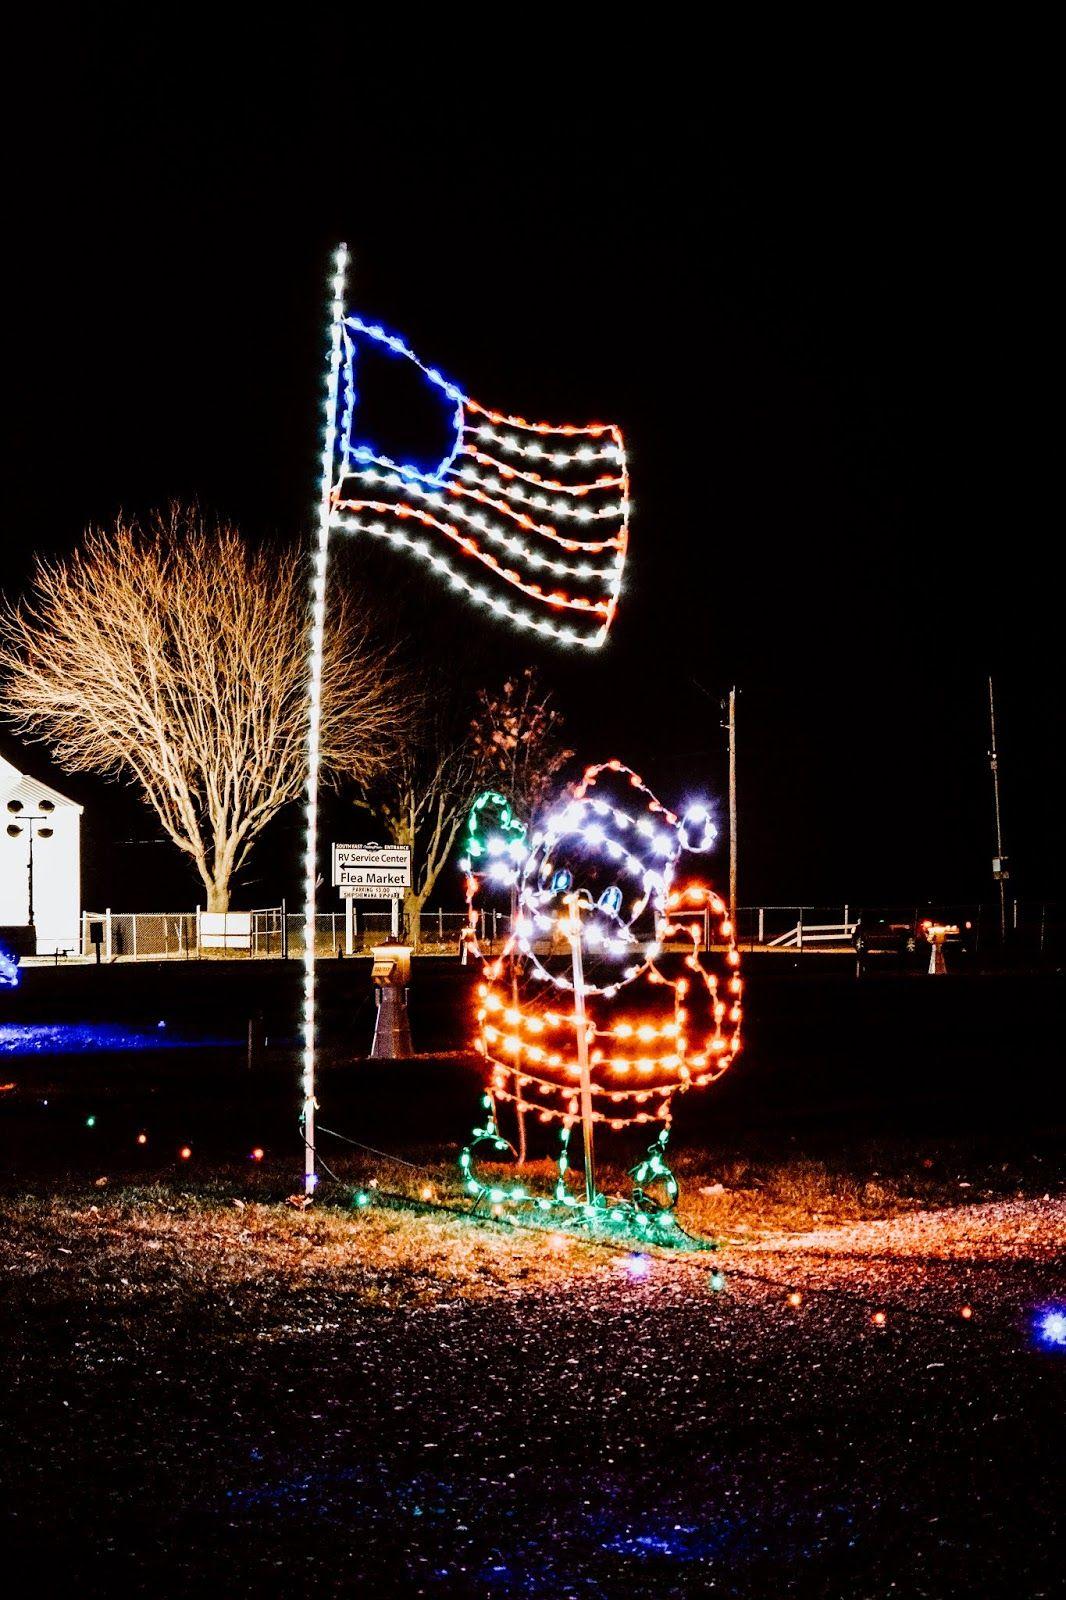 Drive Through the Shipshewana Lights of Joy This Holiday